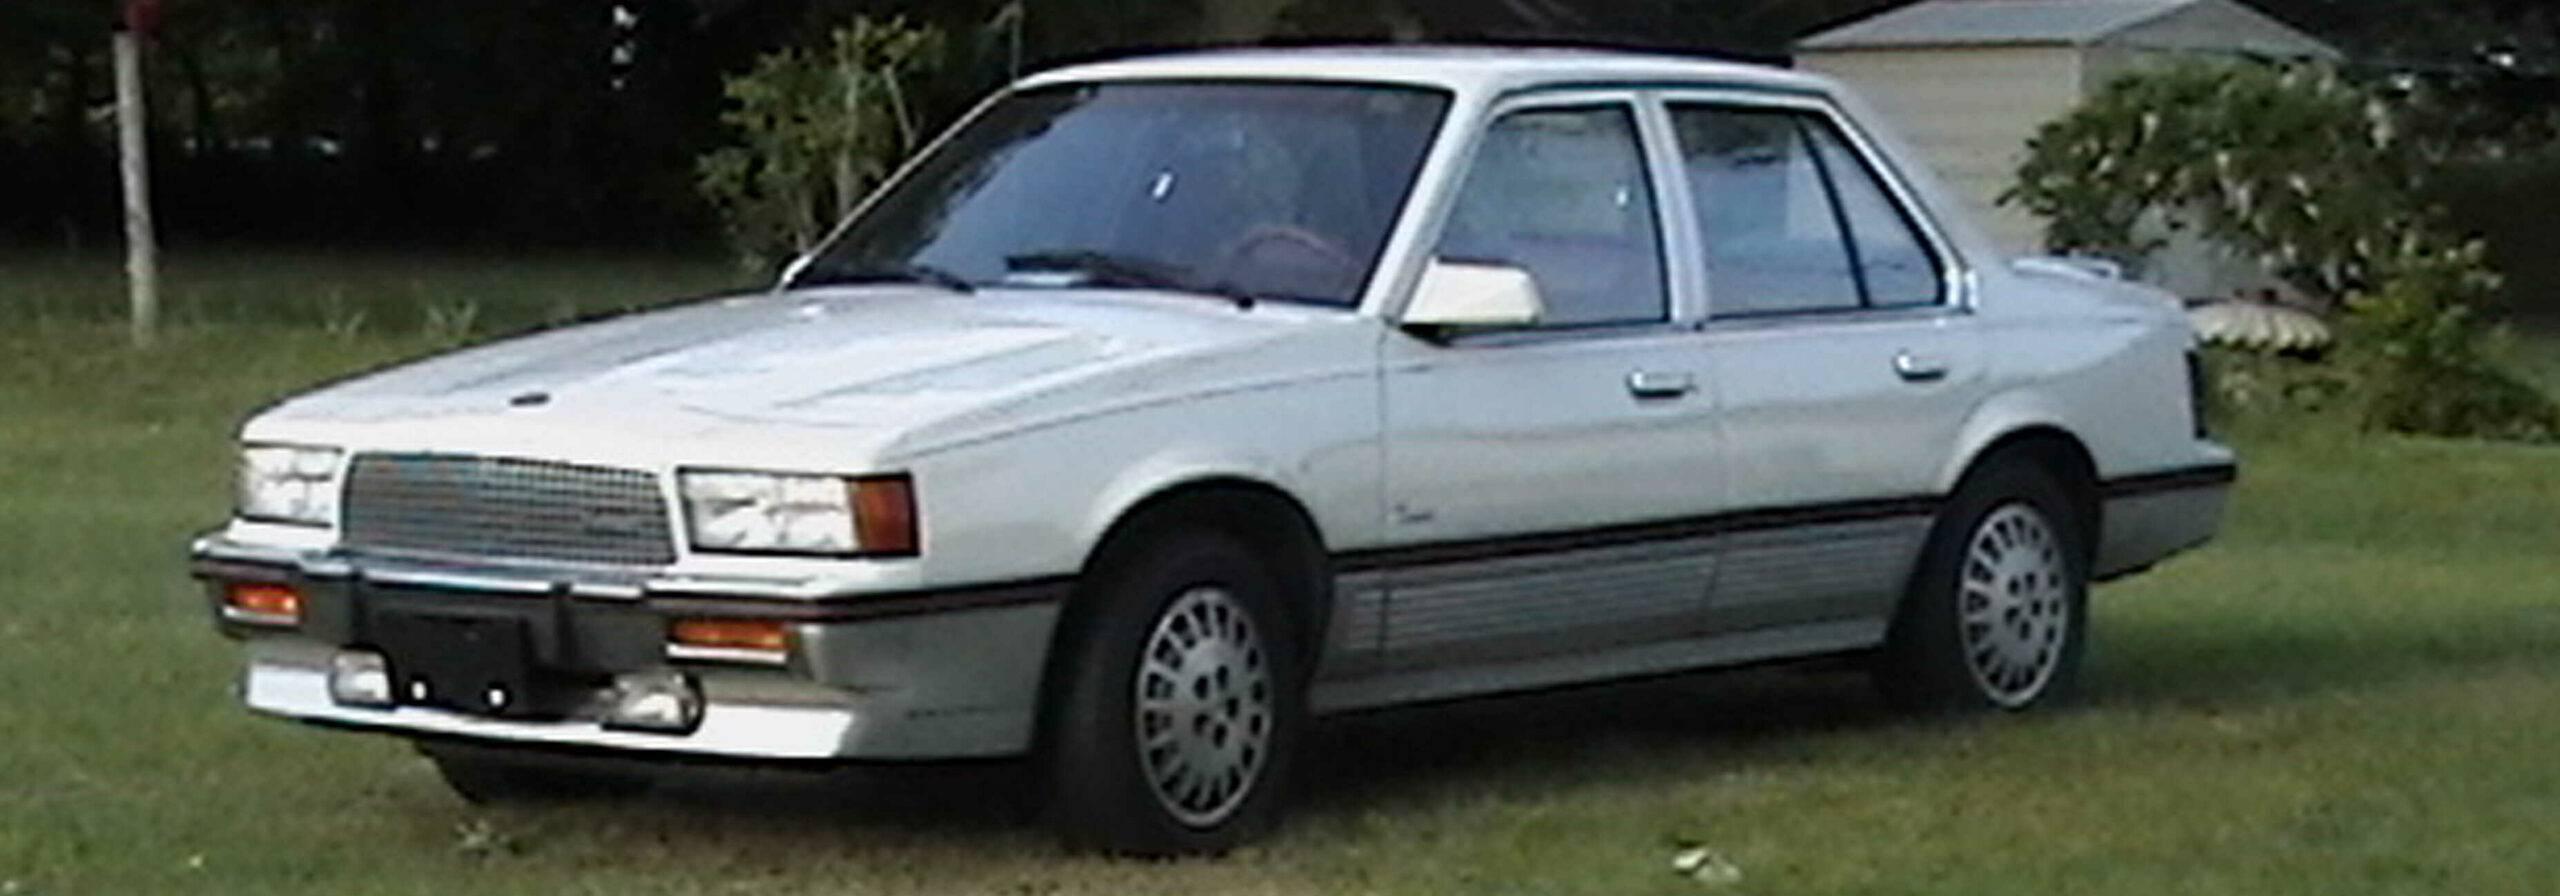 Cadillac's Cimarron car